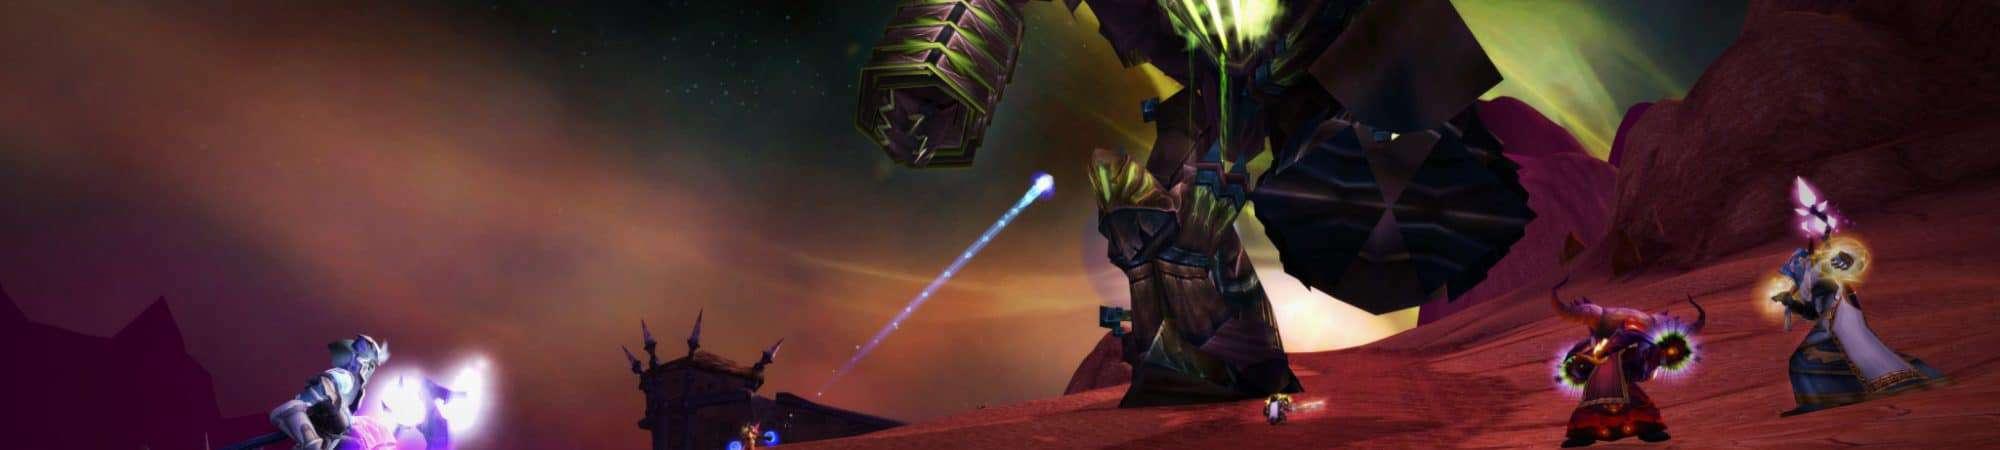 Personagens enfrentam um Fel Reaver em World of Warcraft Classic: The Burning Crusase